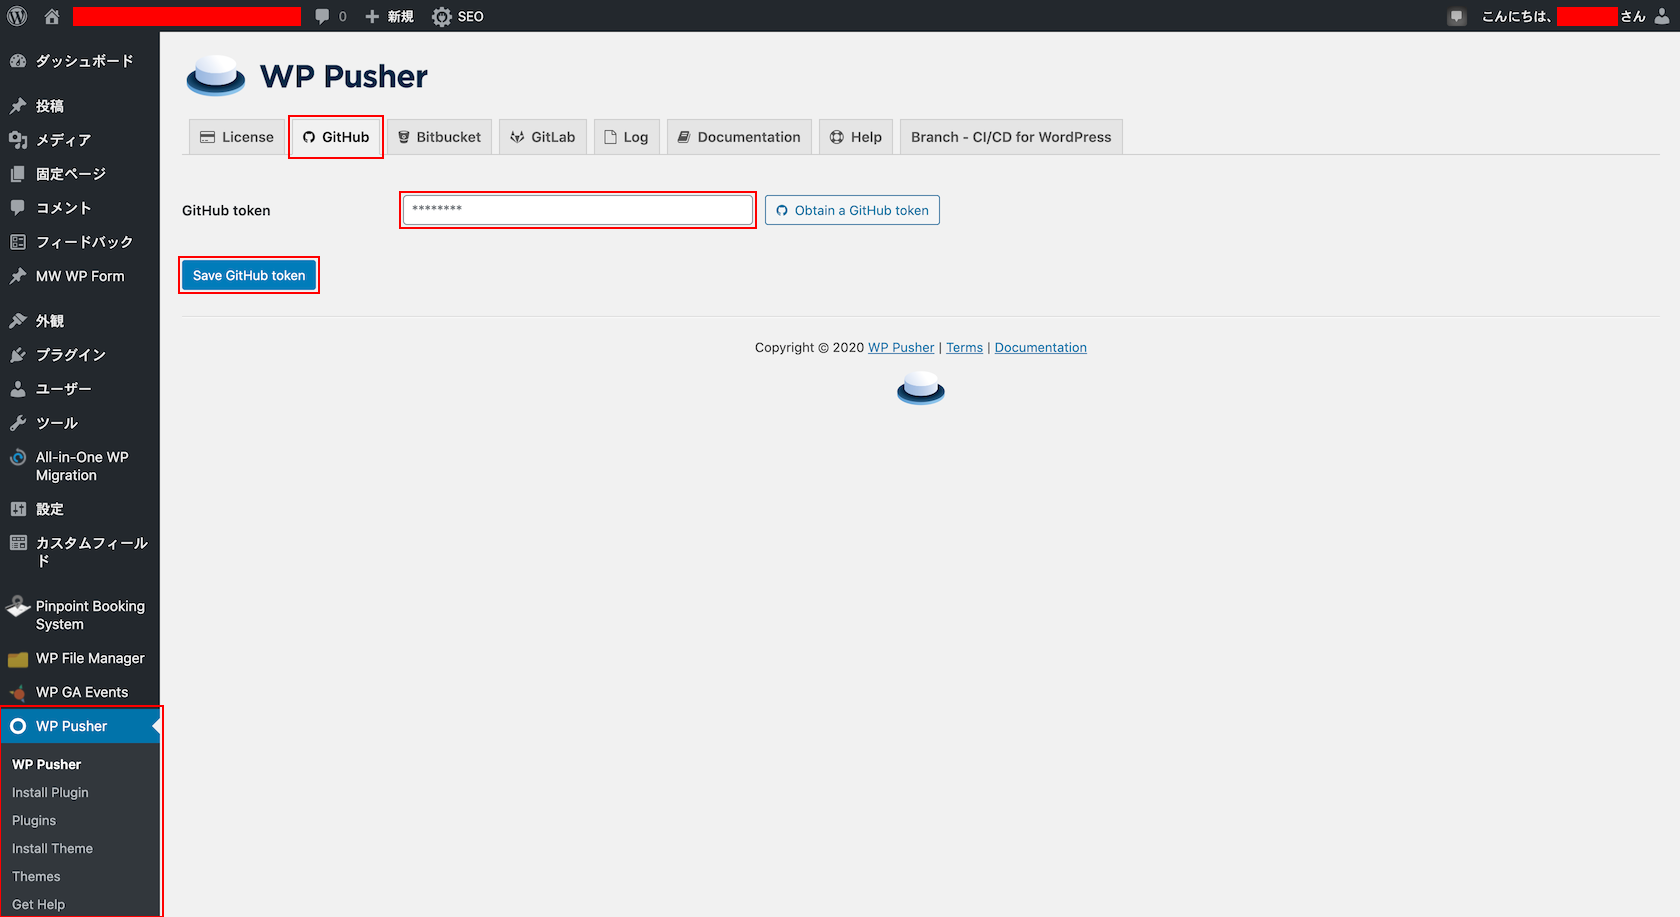 FireShot Capture 302 - WP Pusher ‹ 【Shifter 検証用】現場クラウド Conne — WordPress - testgenbasupportcom.local.png